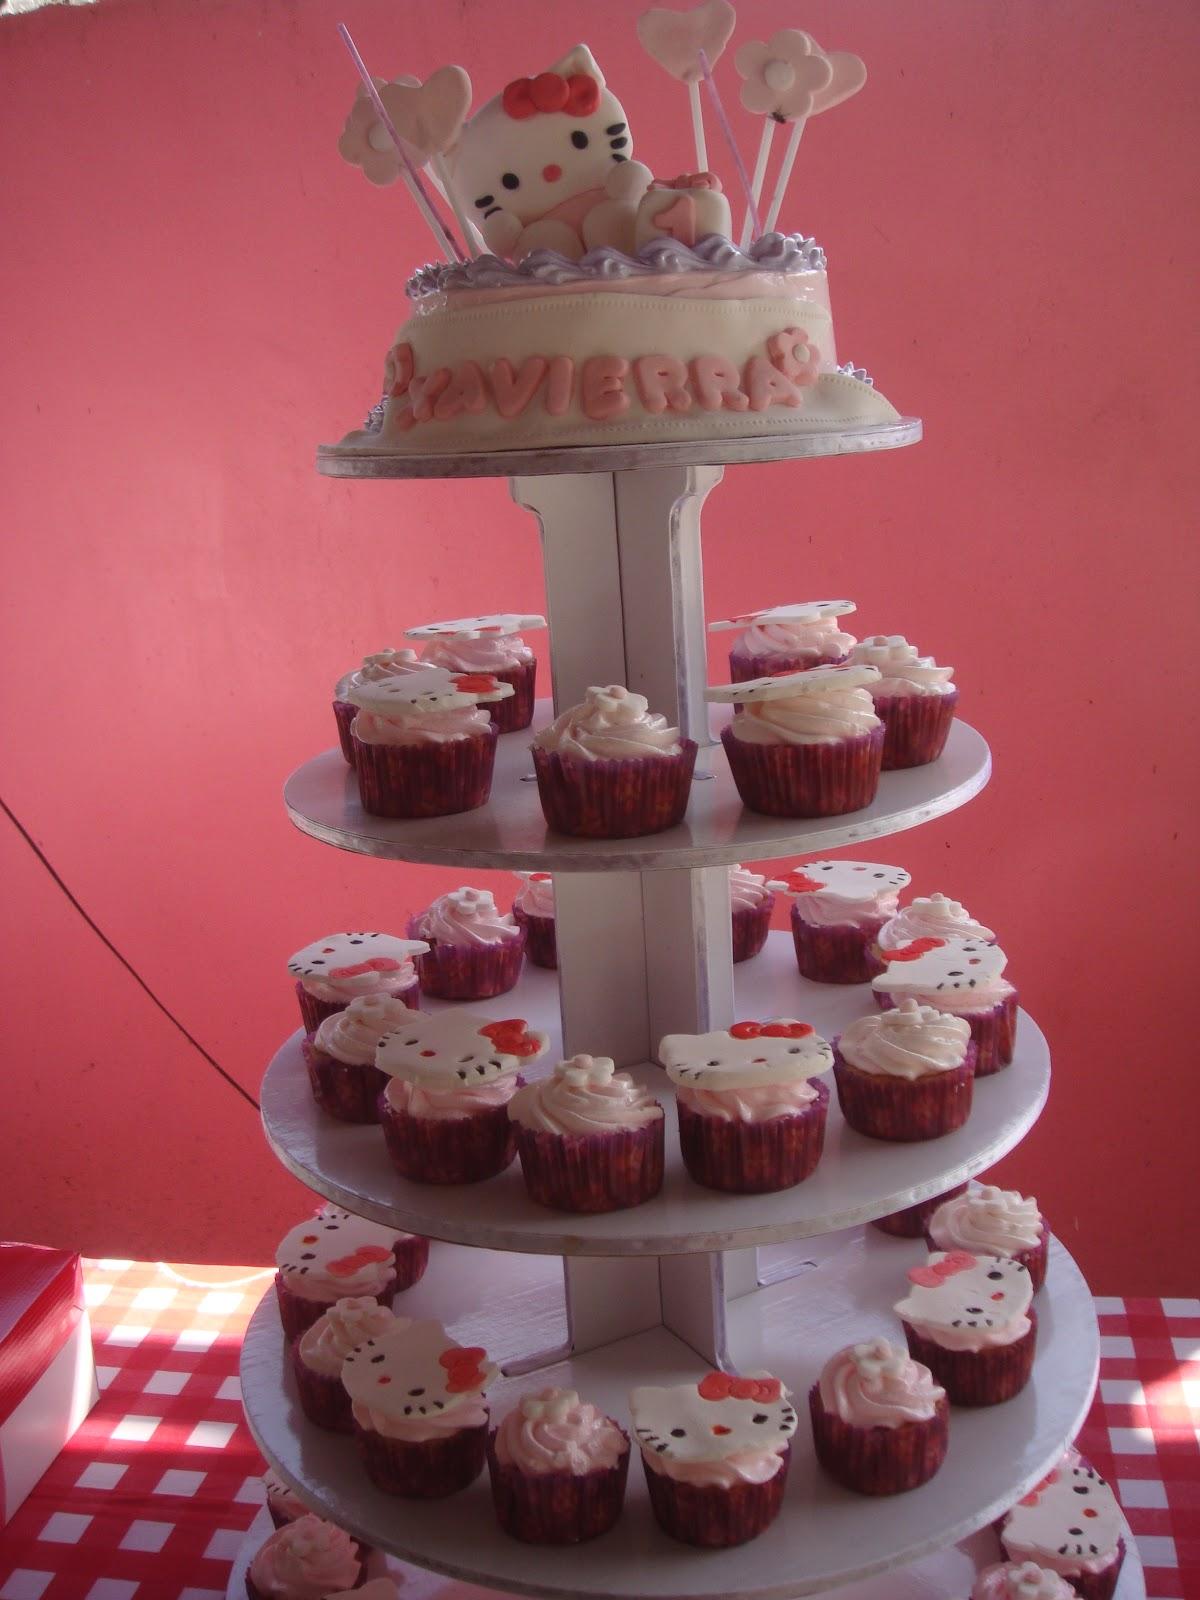 Yencakes Hello Kitty Cupcake Tower